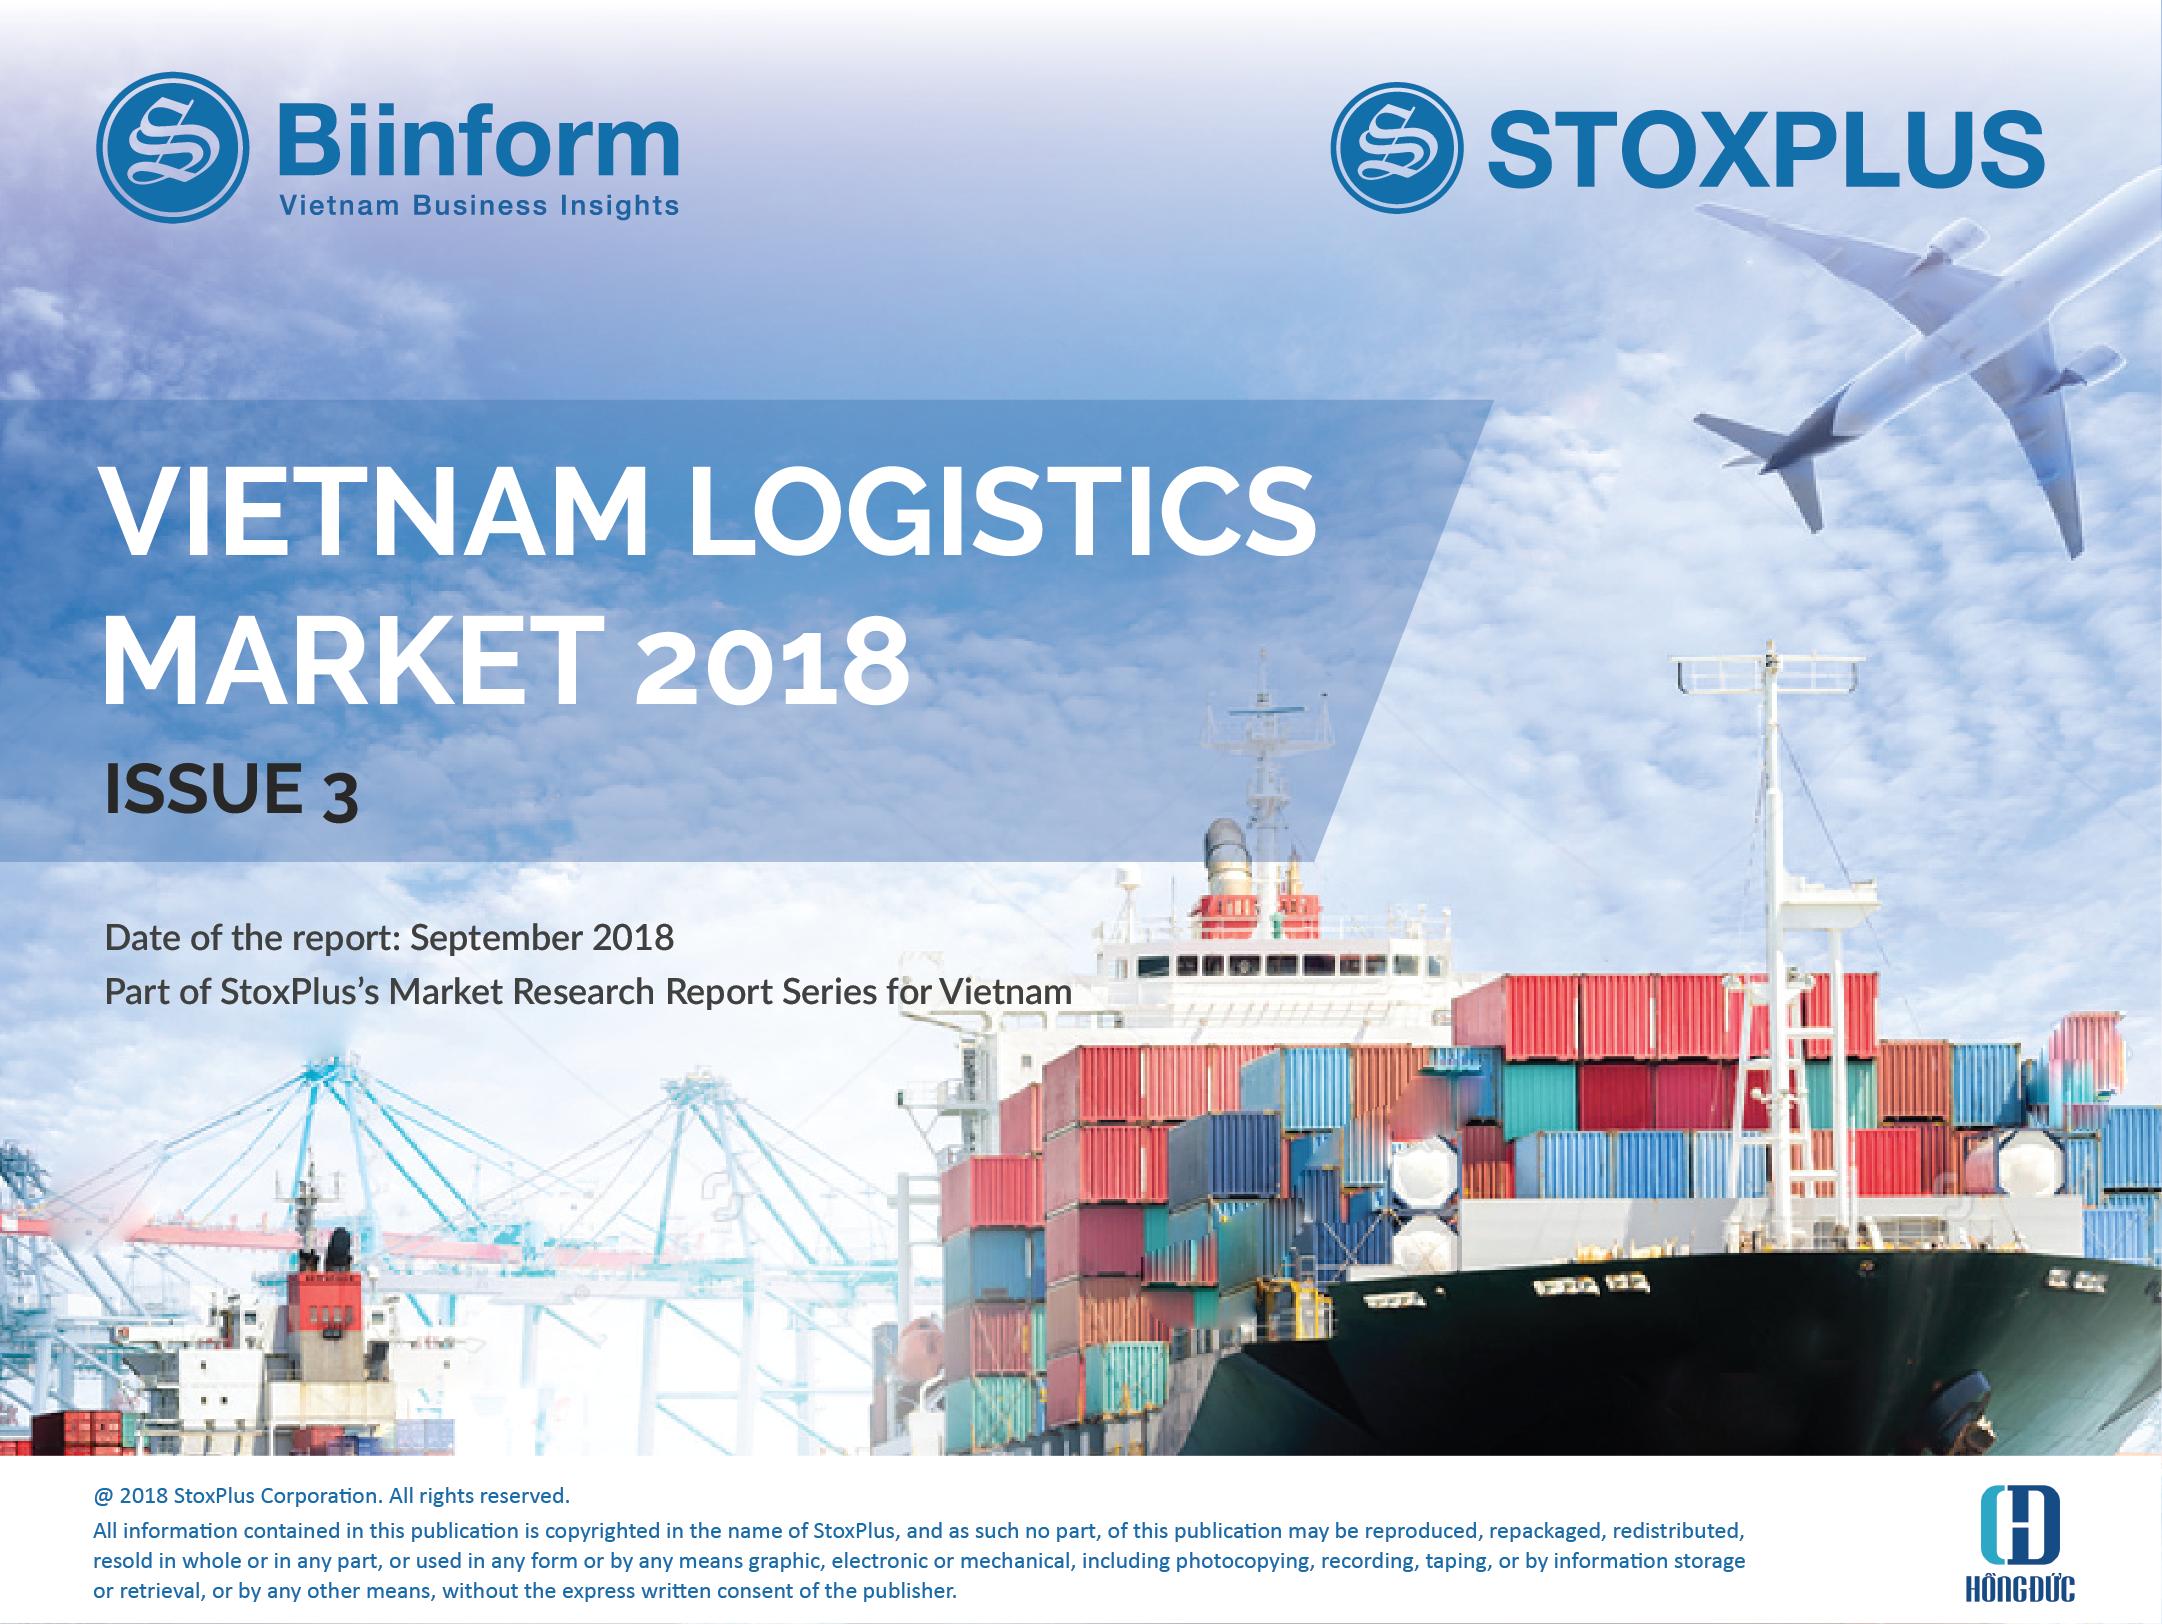 Vietnam Logistics Market 2018 Report